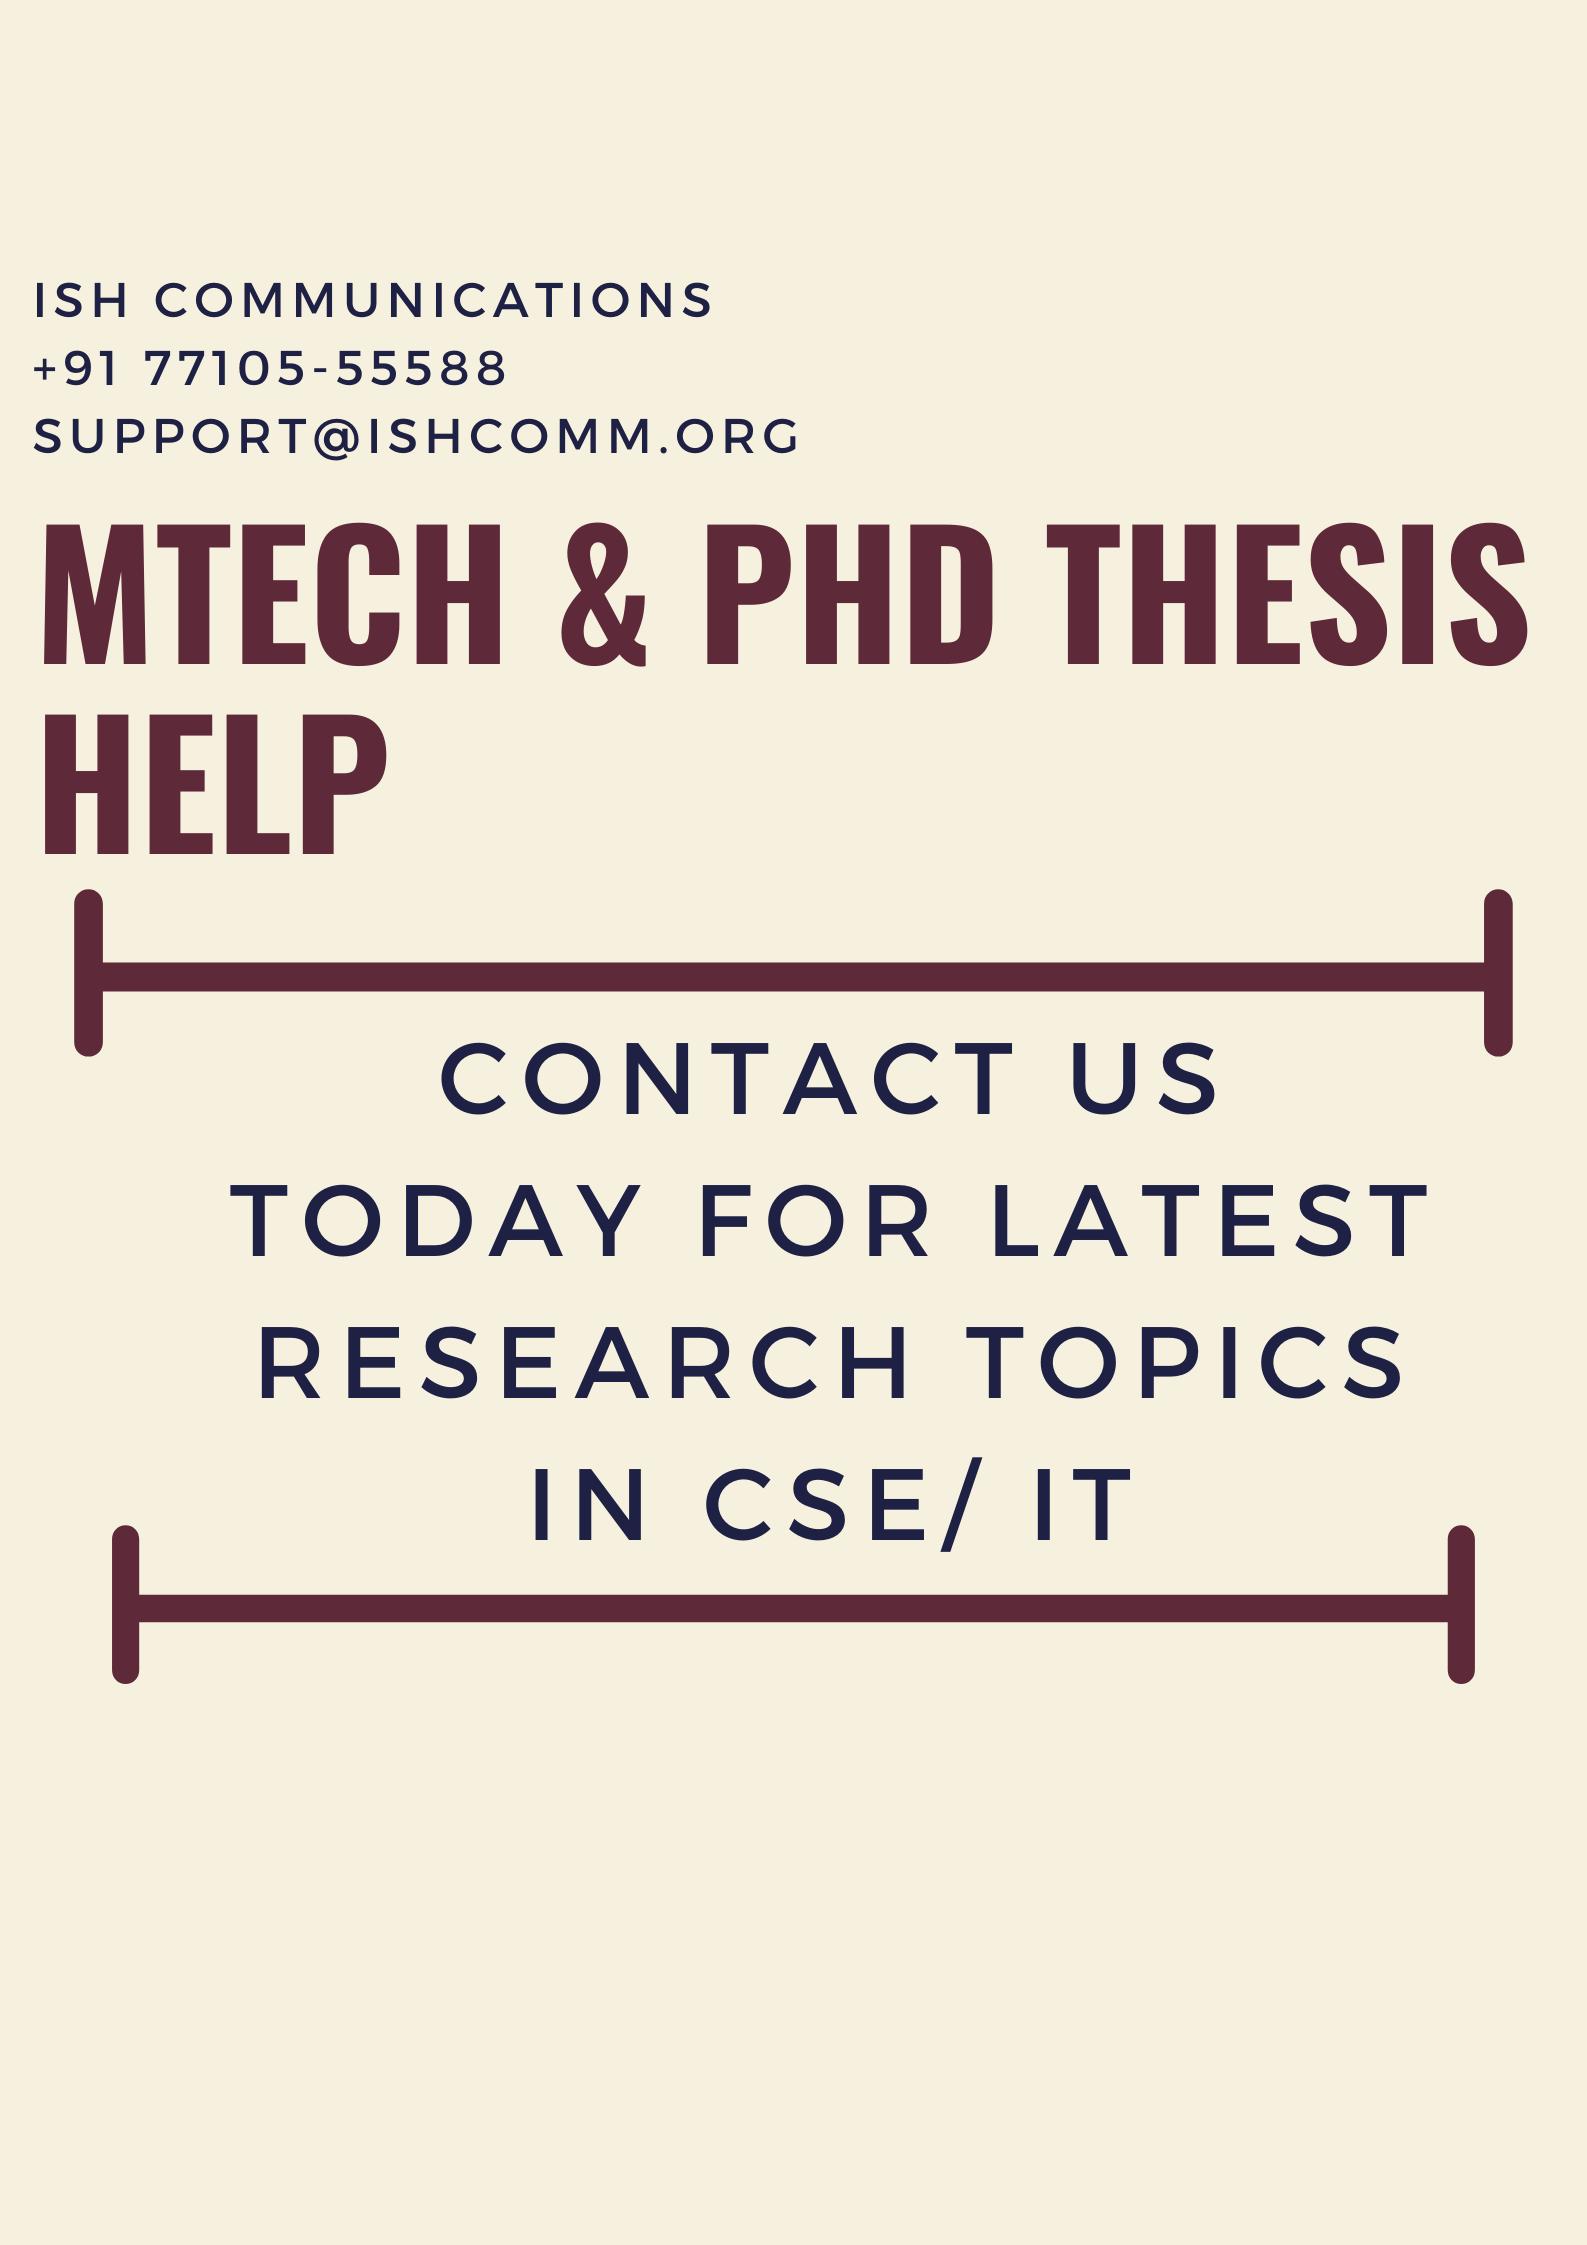 Cse It Latest Research Topic Machine Learning Data Mining Topics Cloud Computing Dissertation